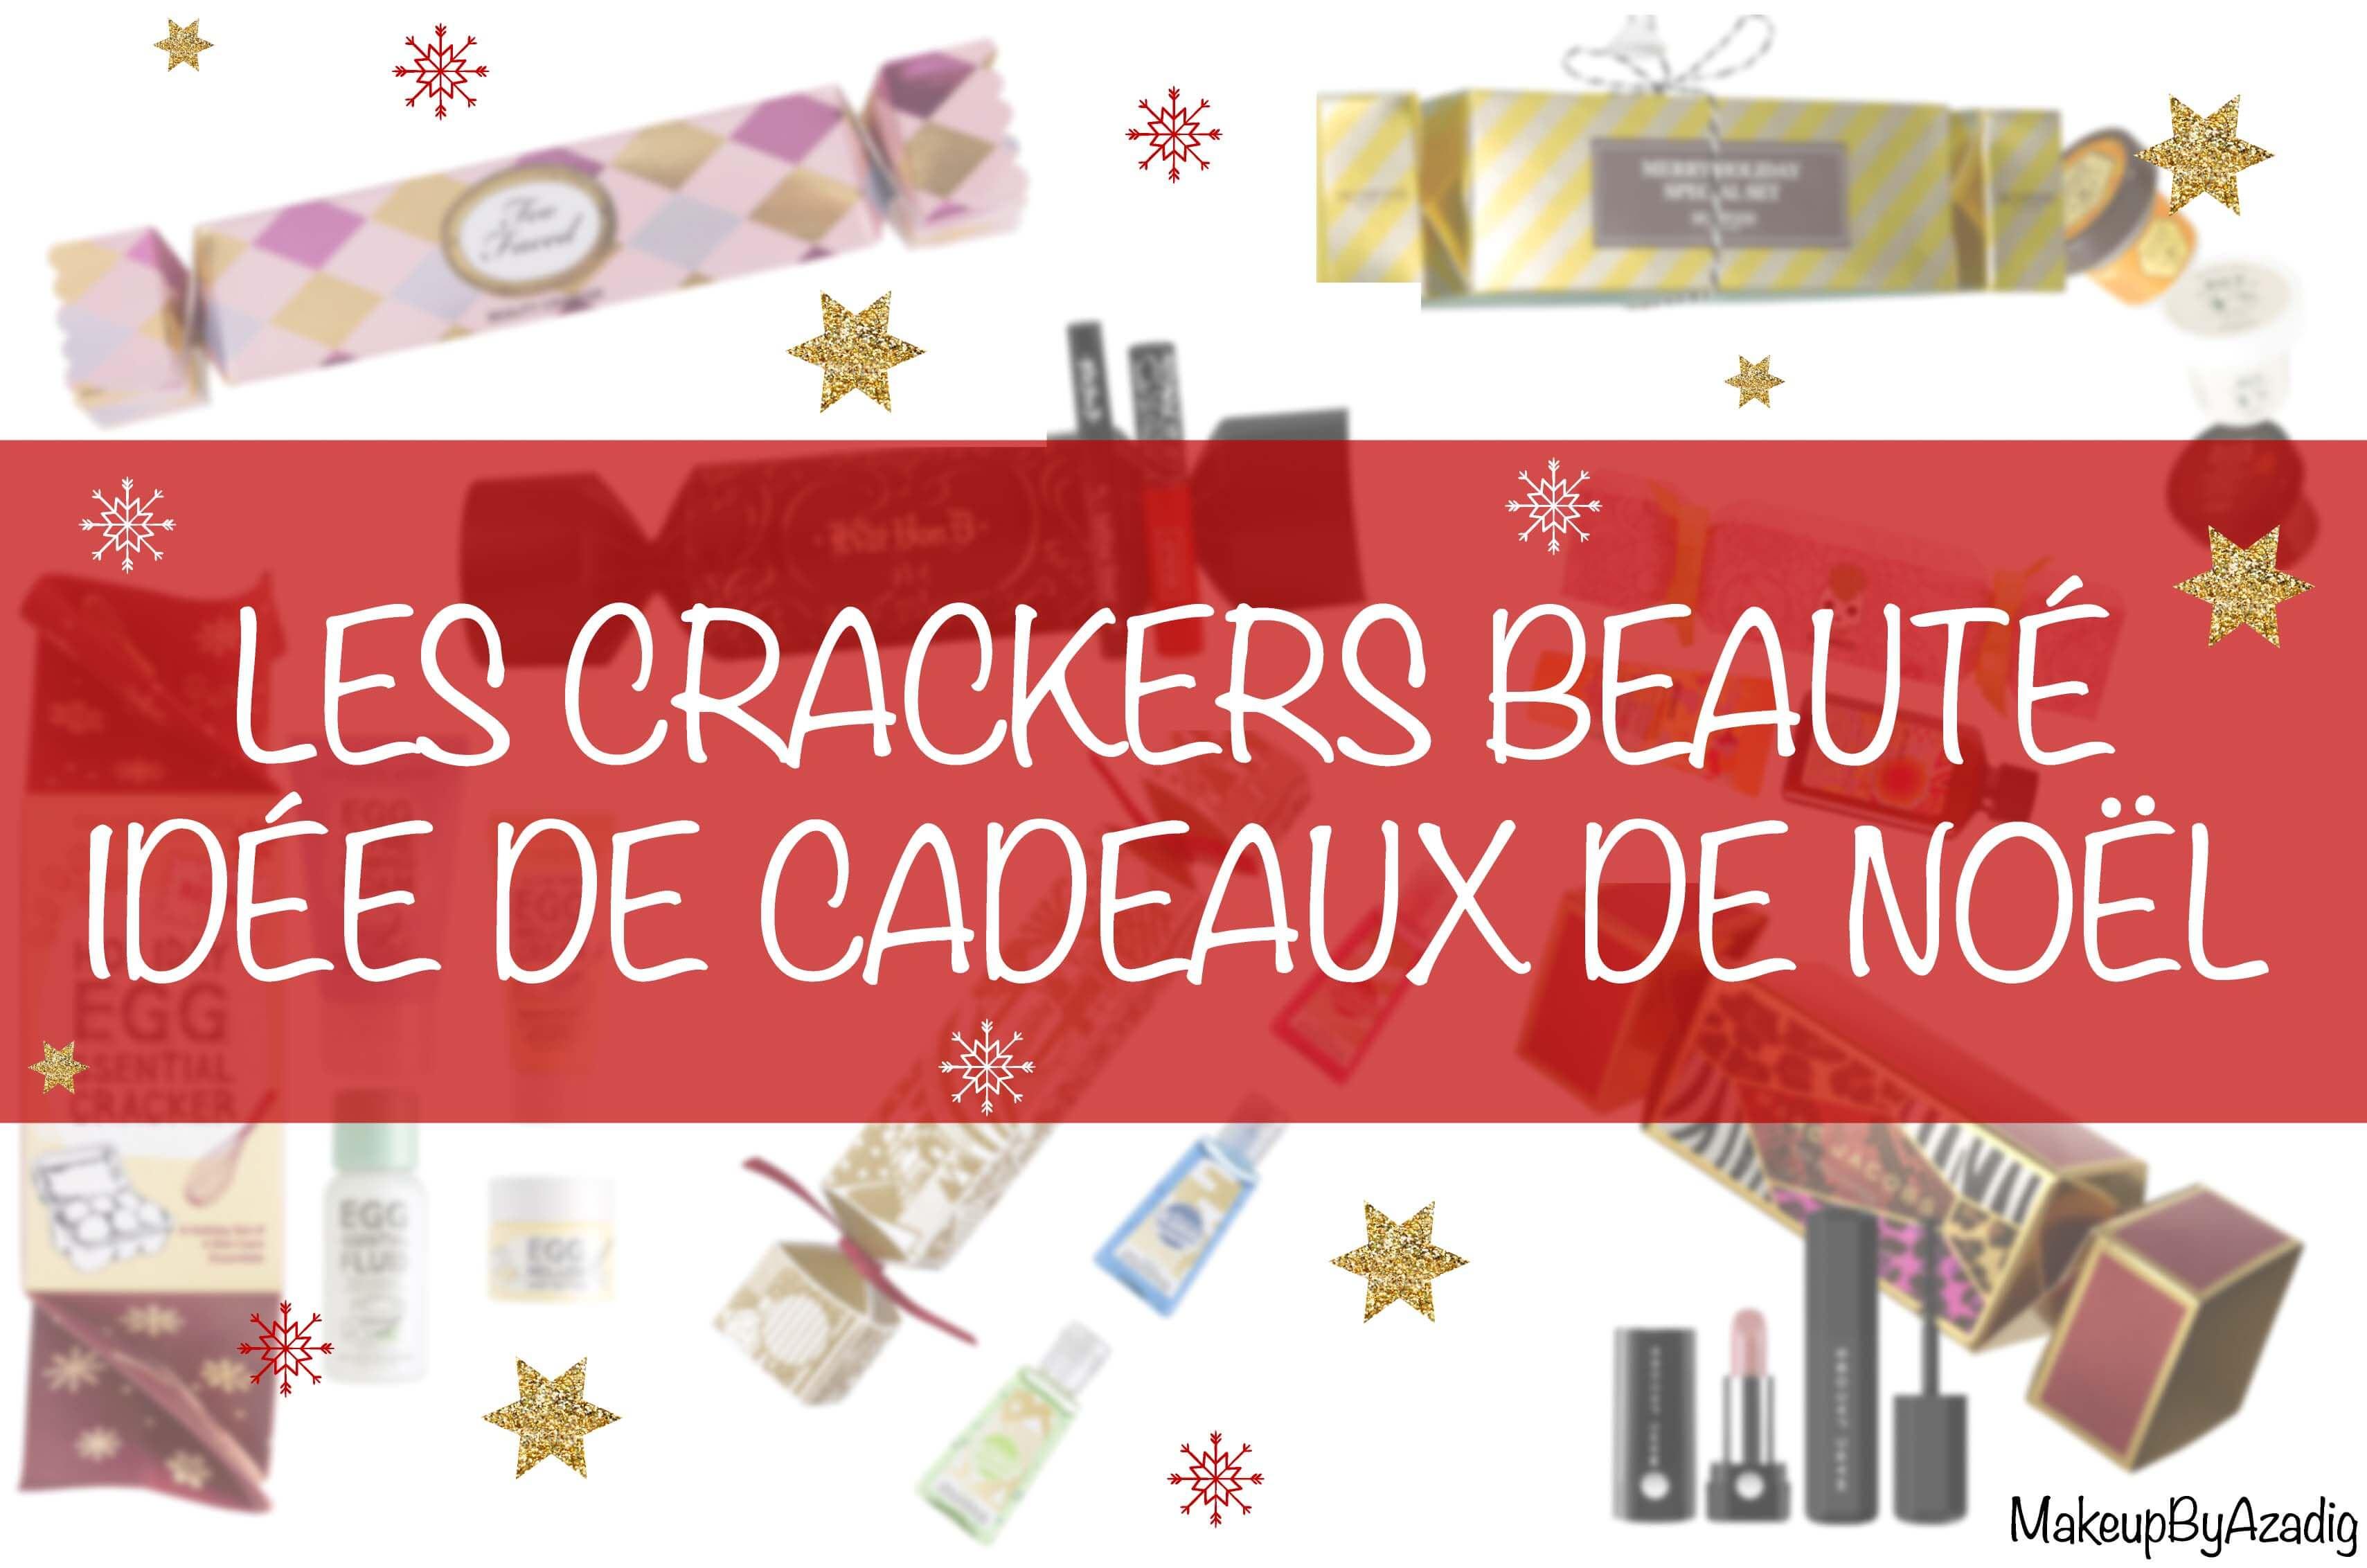 cracker-noel-marcjacobsbeauty-toofaced-amika-katvond-erborian-sephora-idee-cadeau-noel-makeupbyazadig